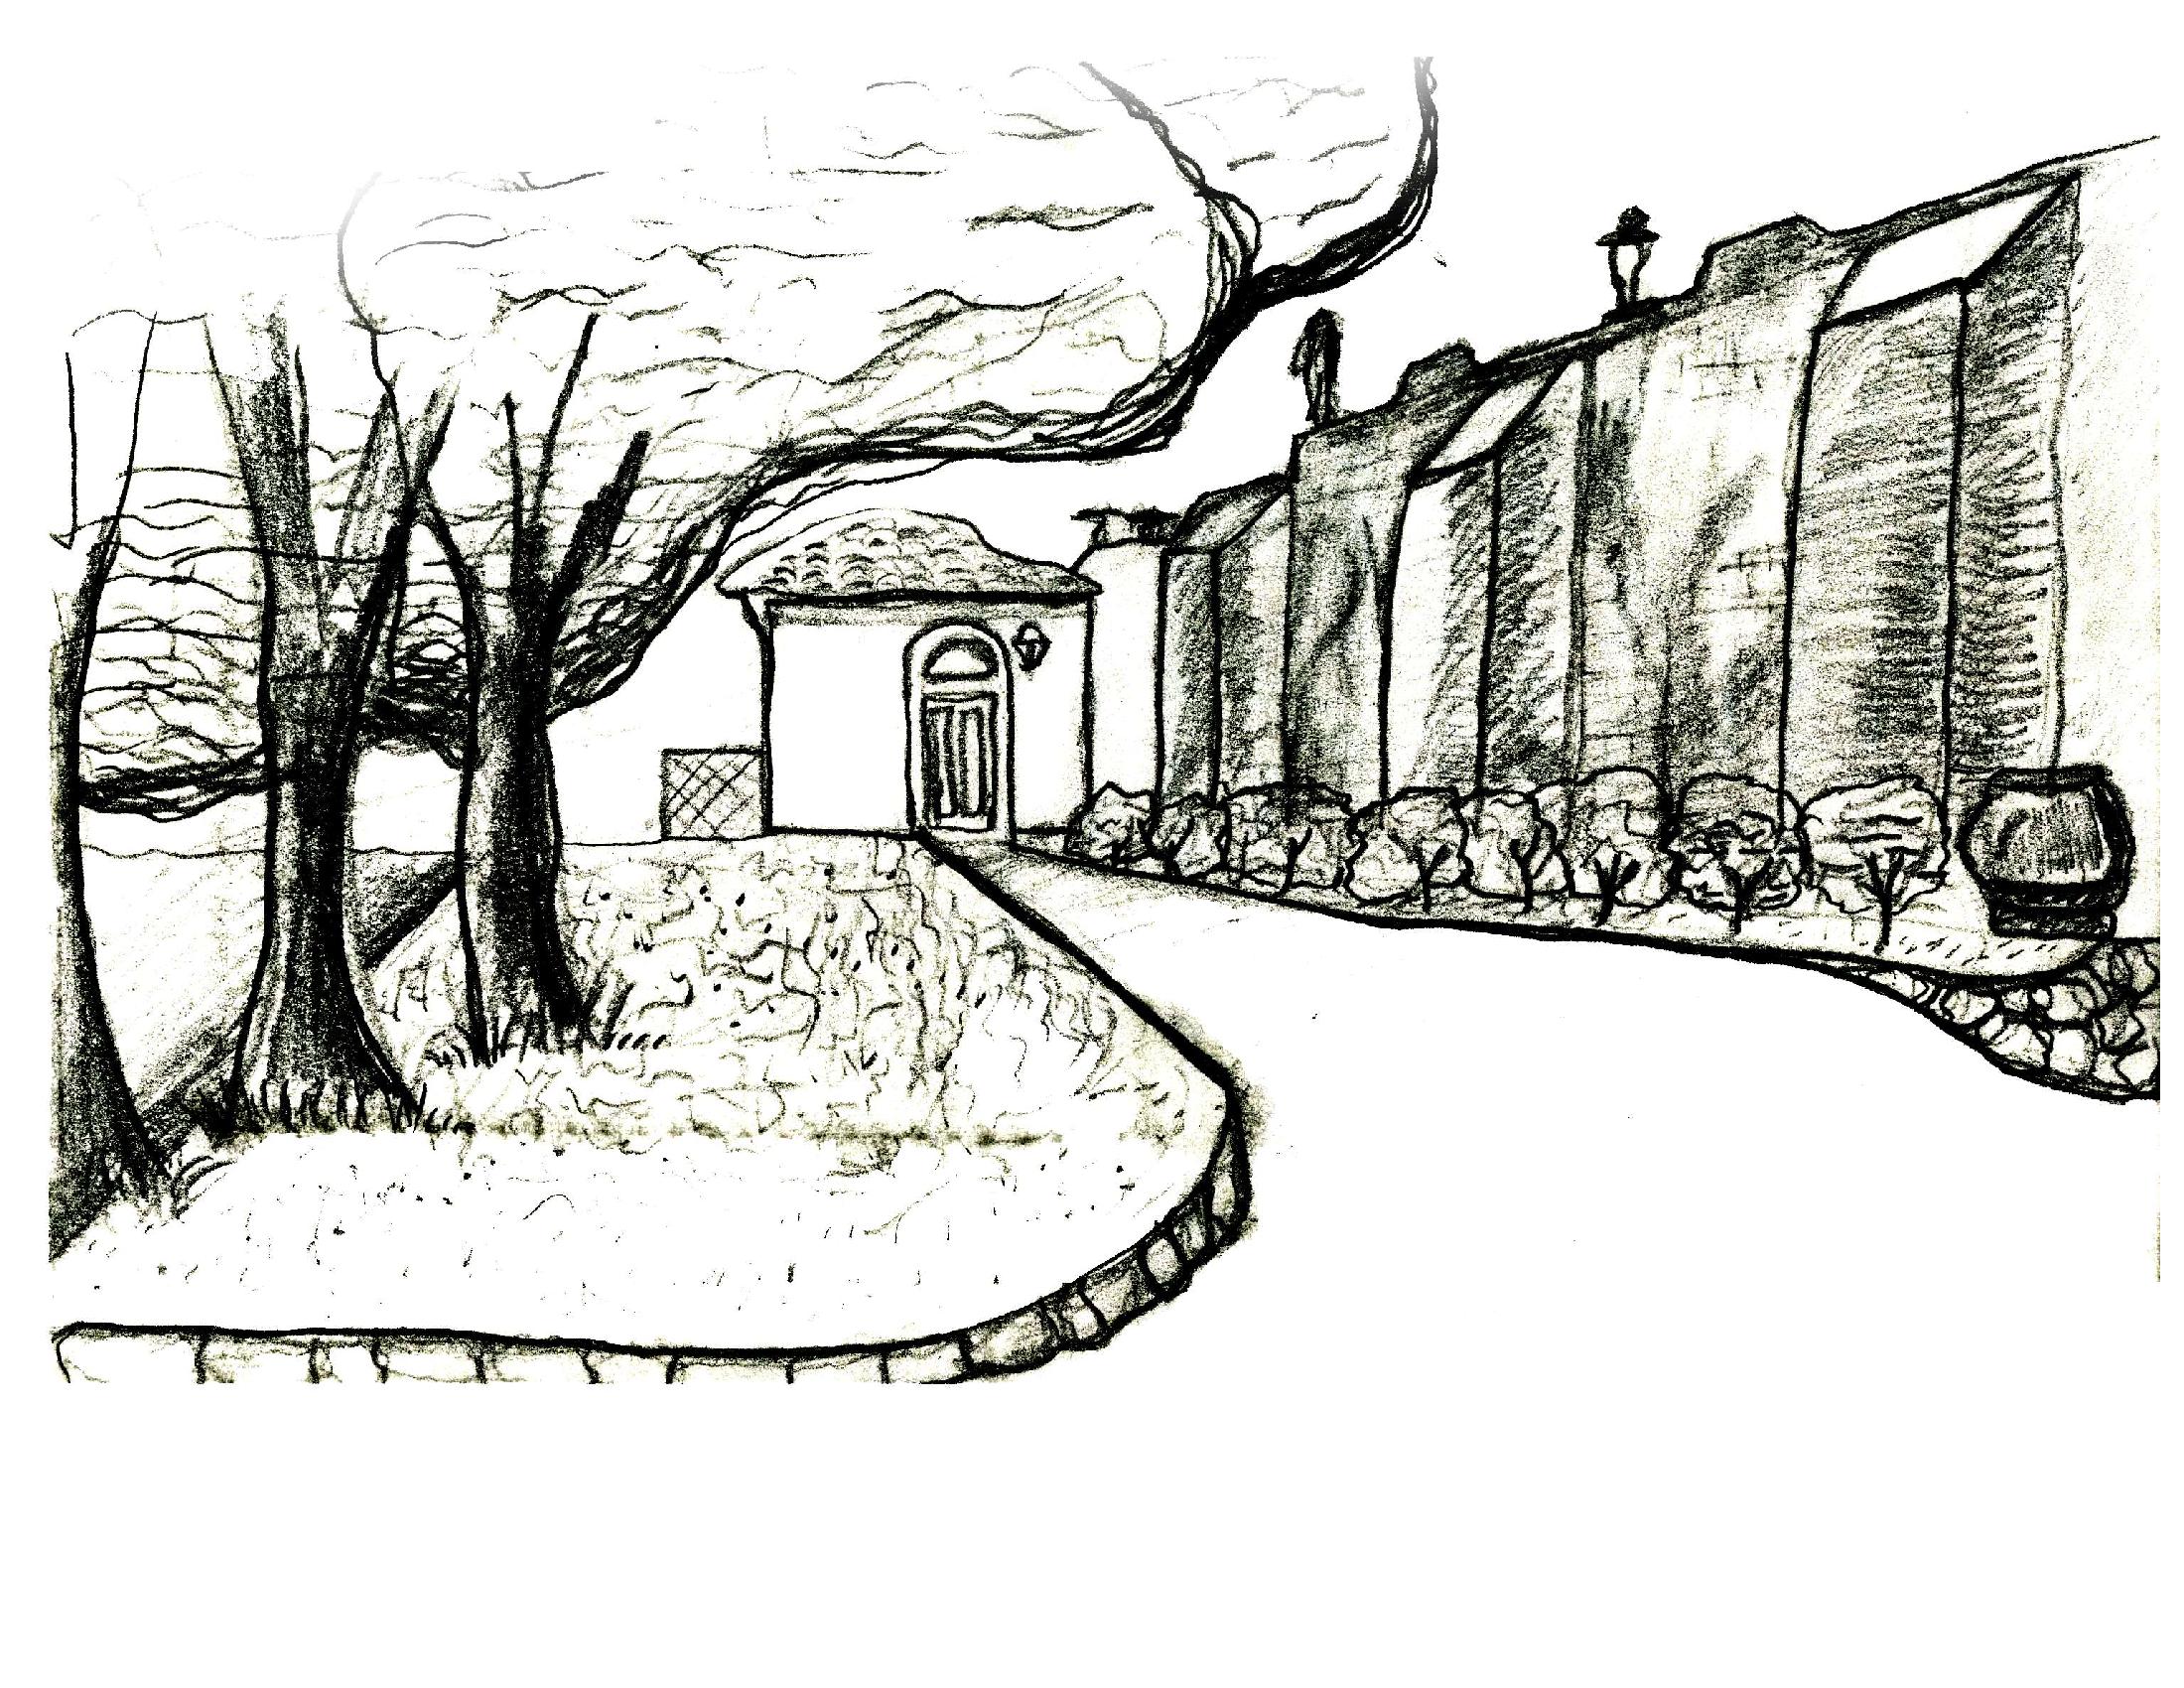 Study Abroad Exterior Sketch